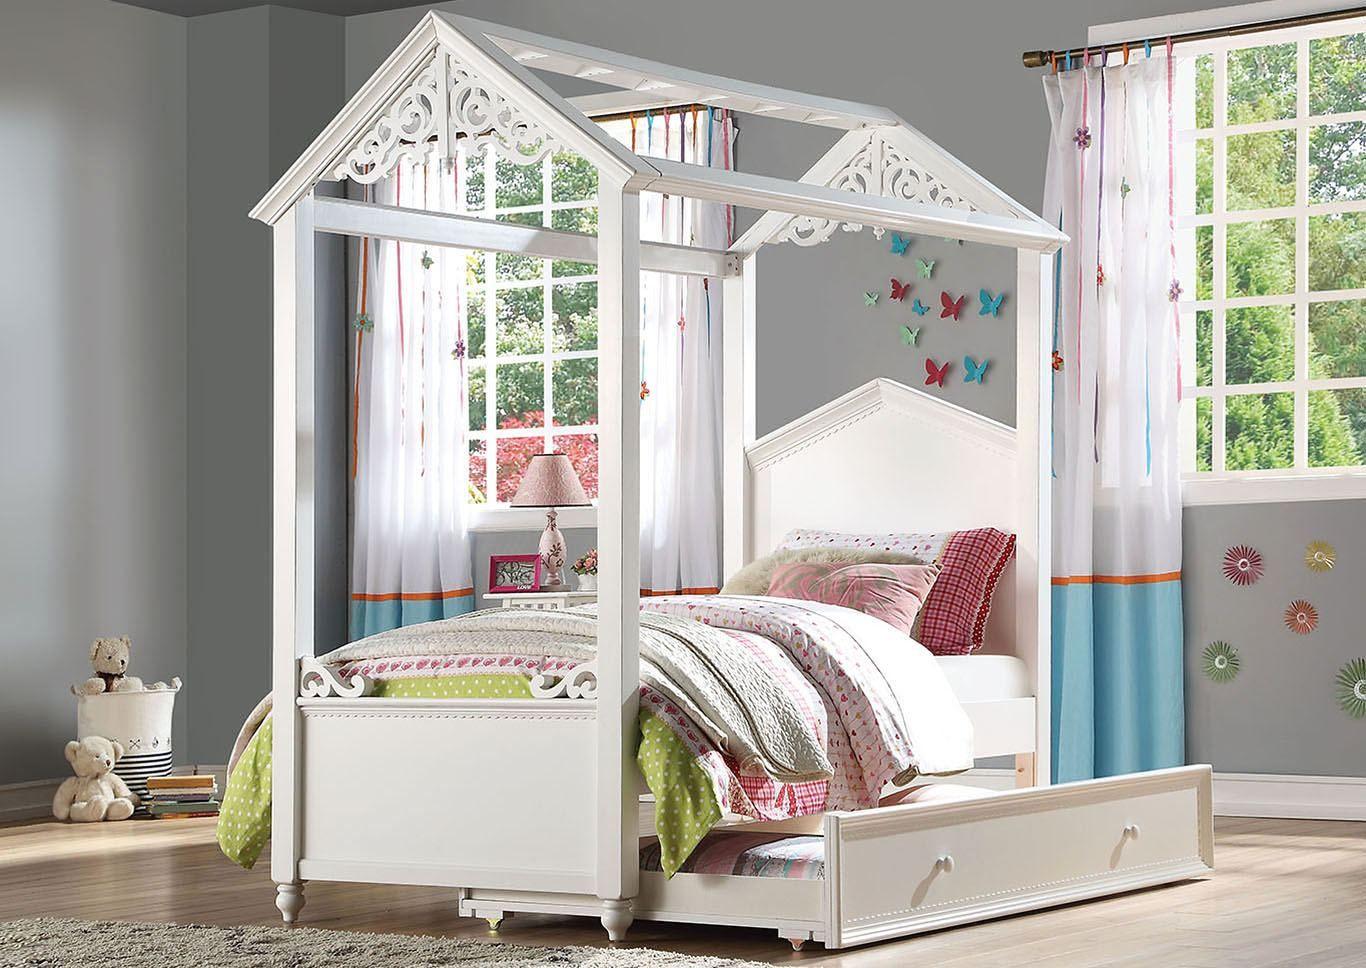 Rapunzel Bedroom Furniture Twin canopy bed, Furniture